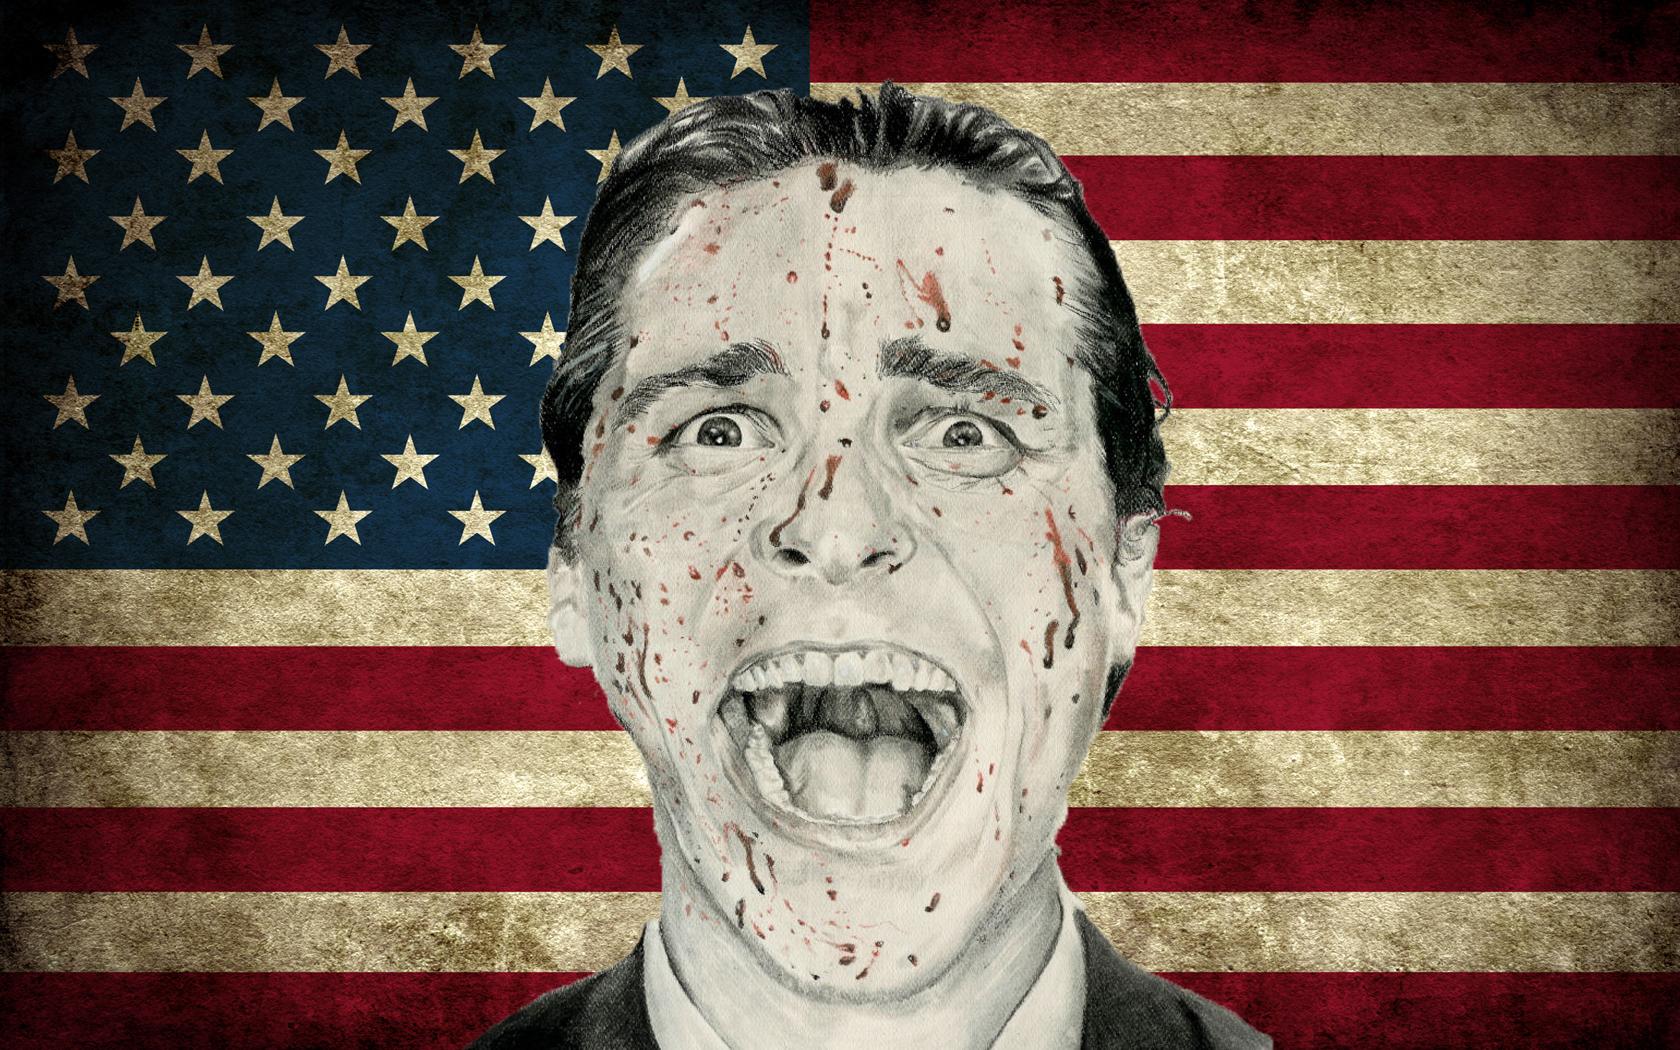 American Psycho Wallpaper by jonnysonny on DeviantArt